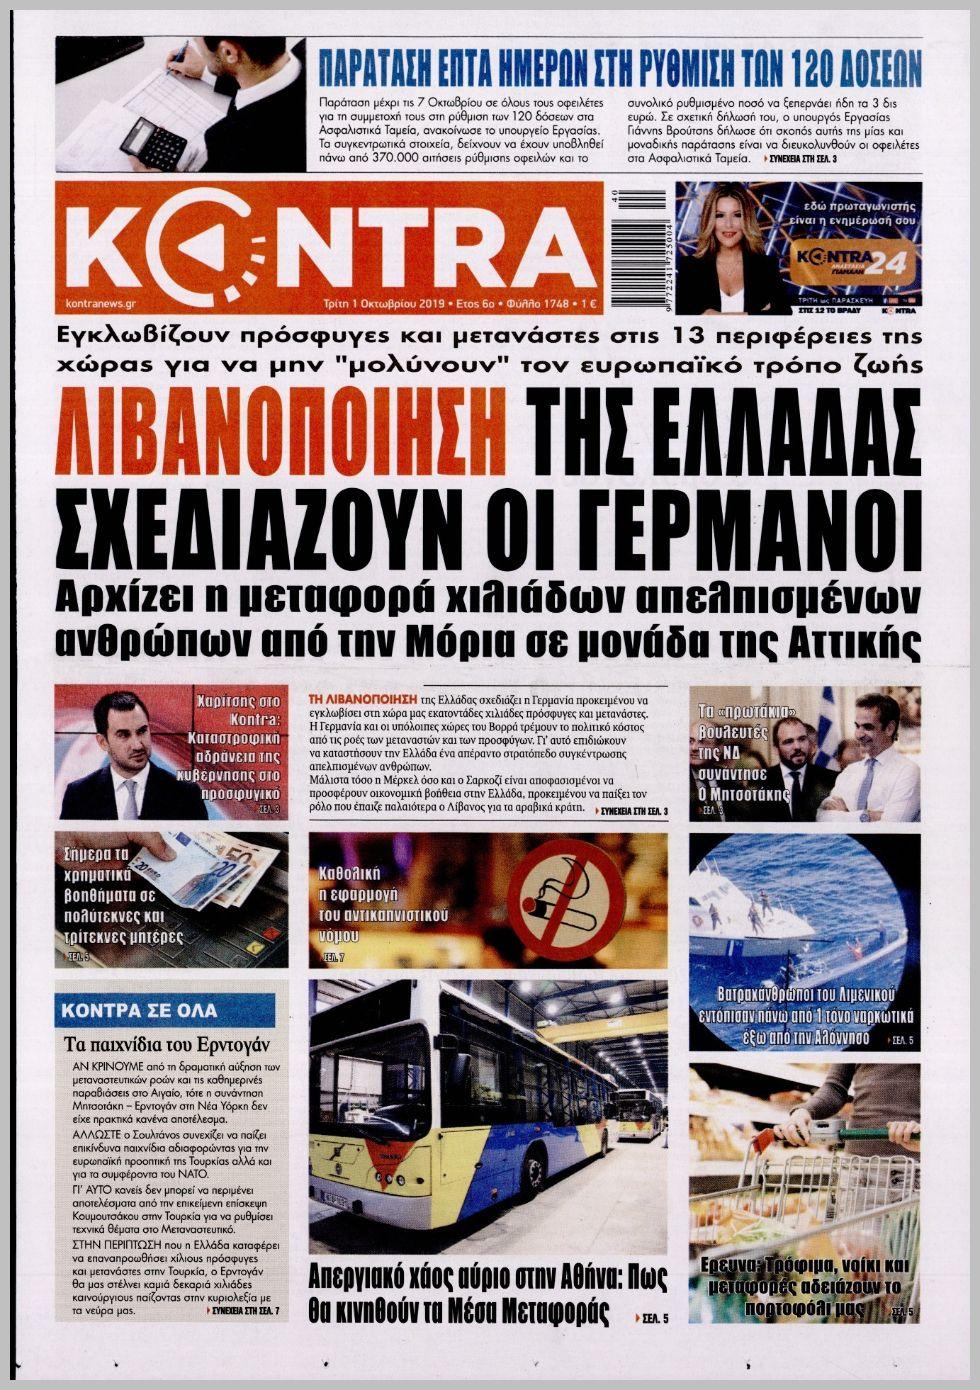 https://protoselida.24media.gr/images/2019/10/01/lrg/20191001_kontra_news_0442.jpg